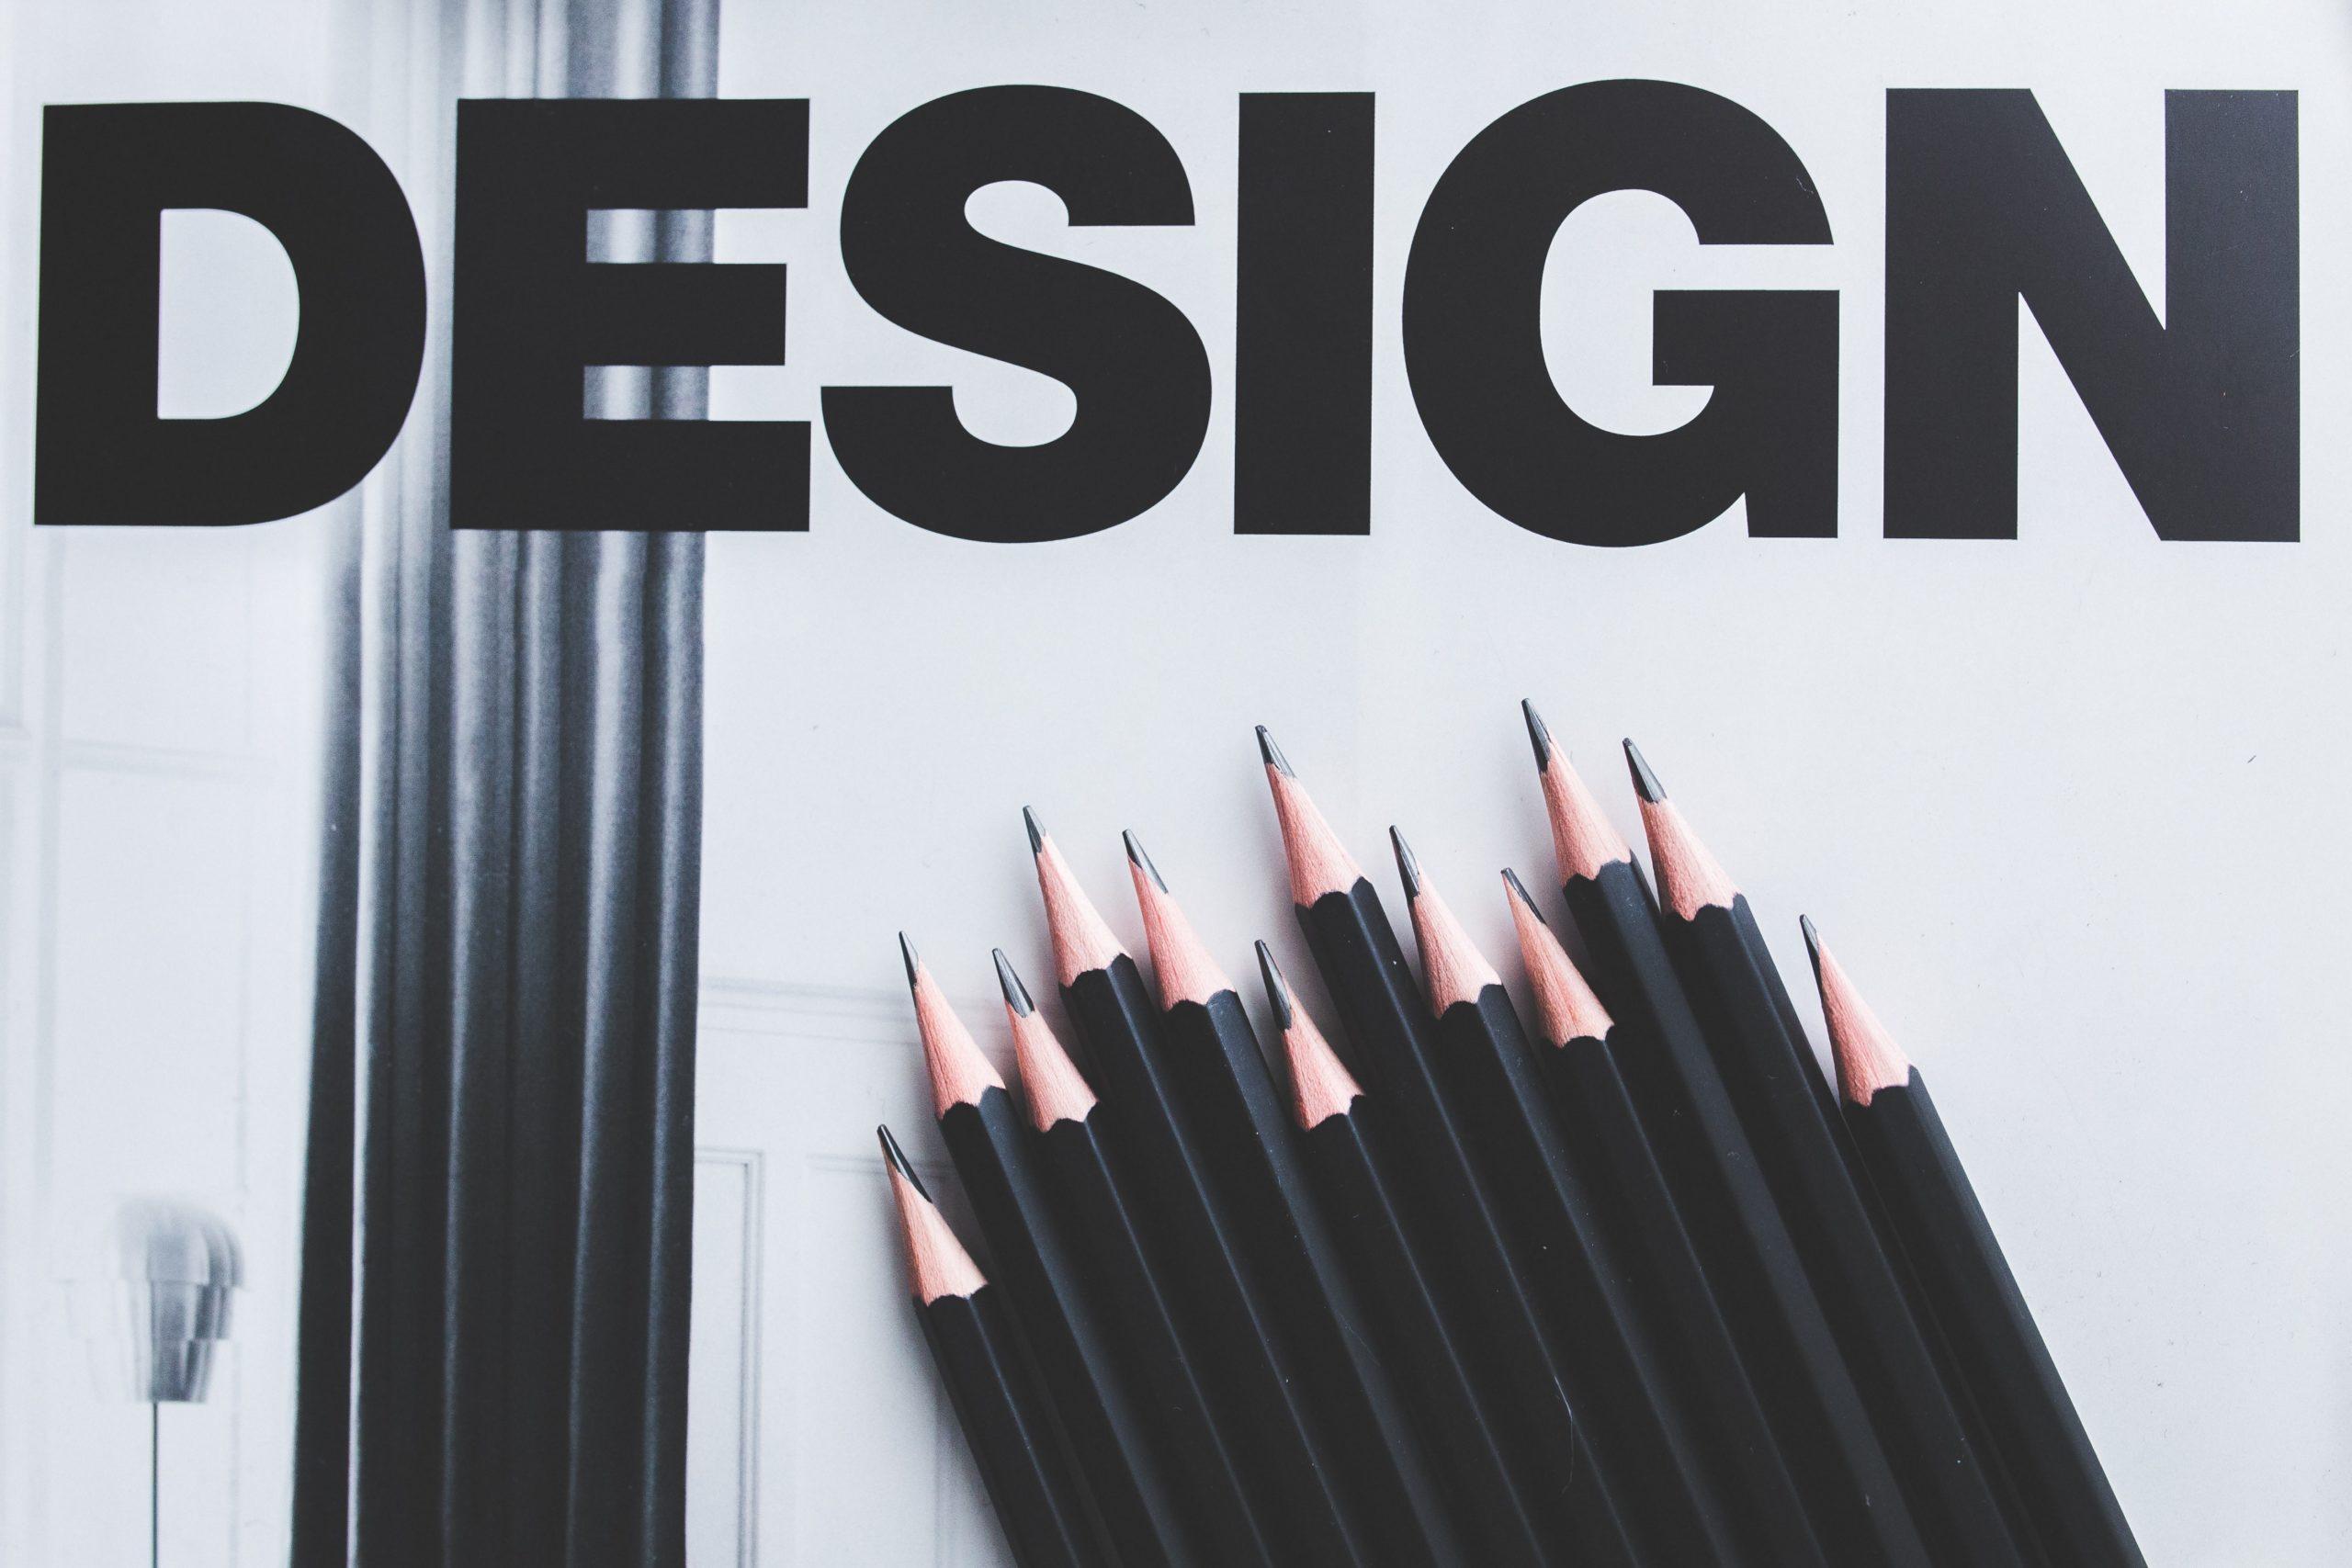 Black pencils superimposed over the word DESIGN